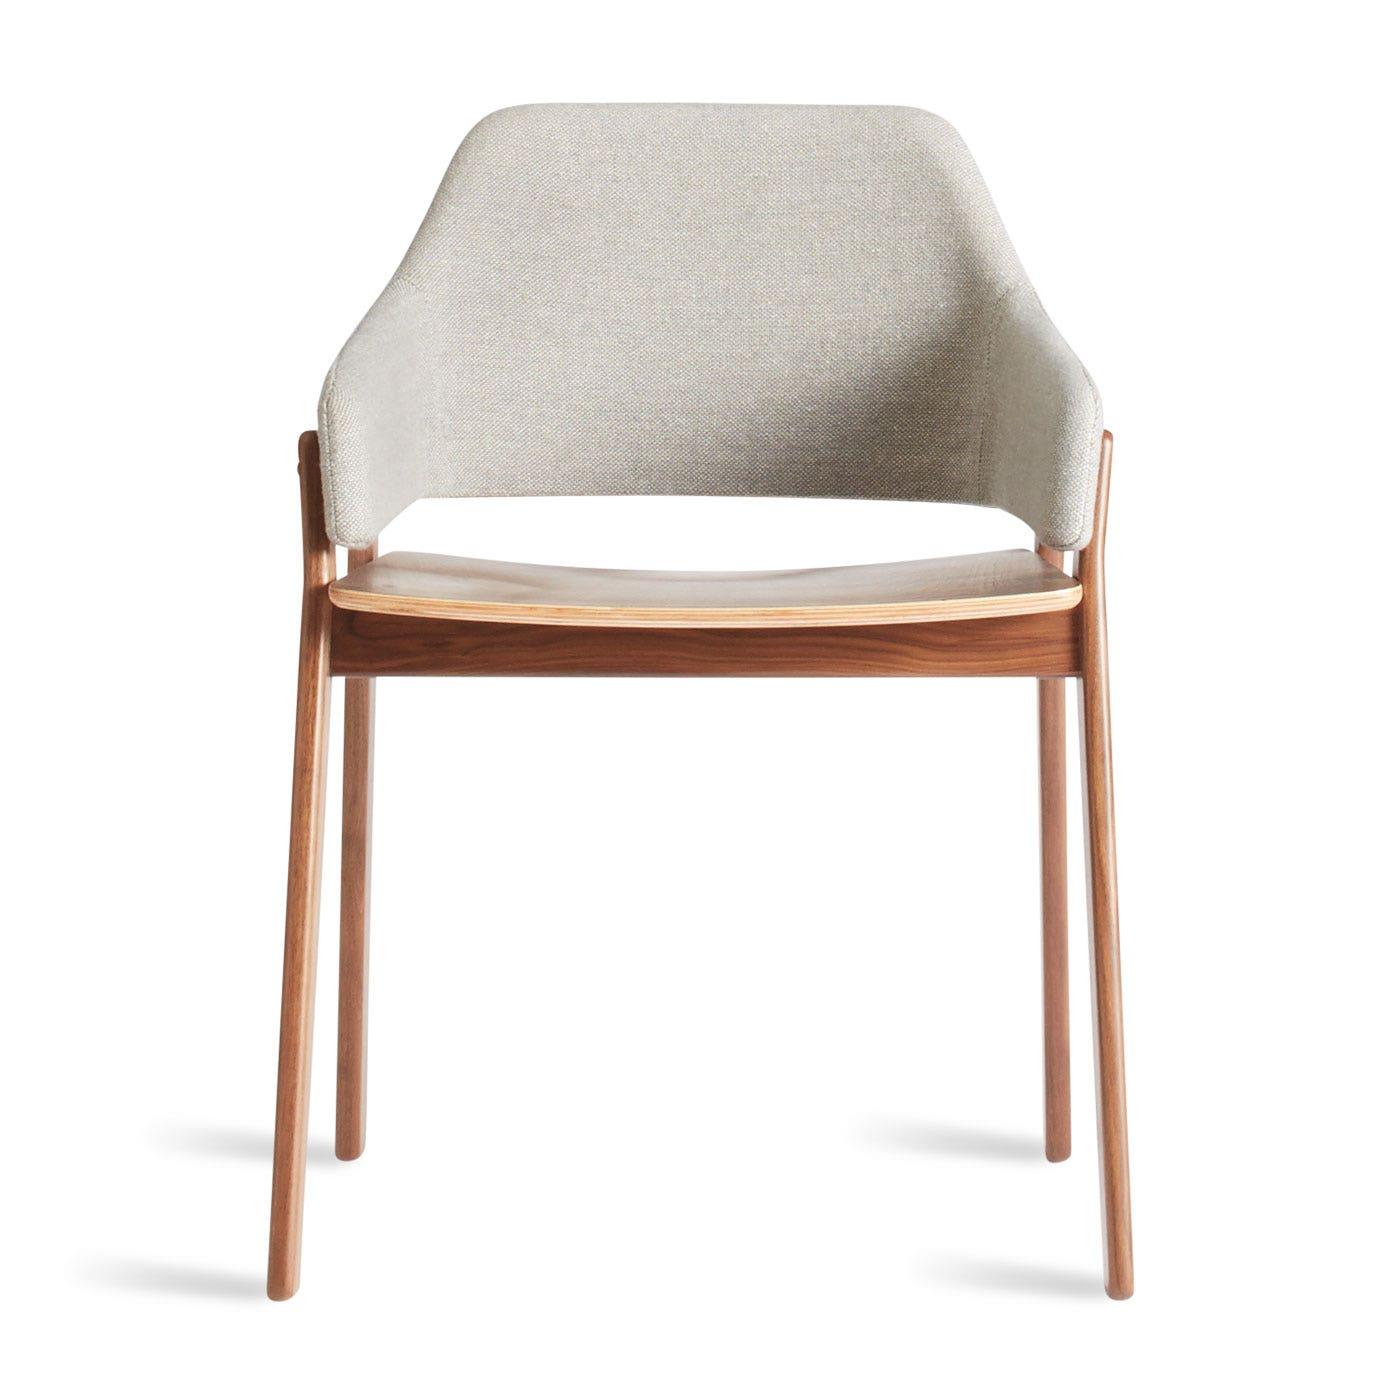 Phenomenal Clutch Chair Creativecarmelina Interior Chair Design Creativecarmelinacom